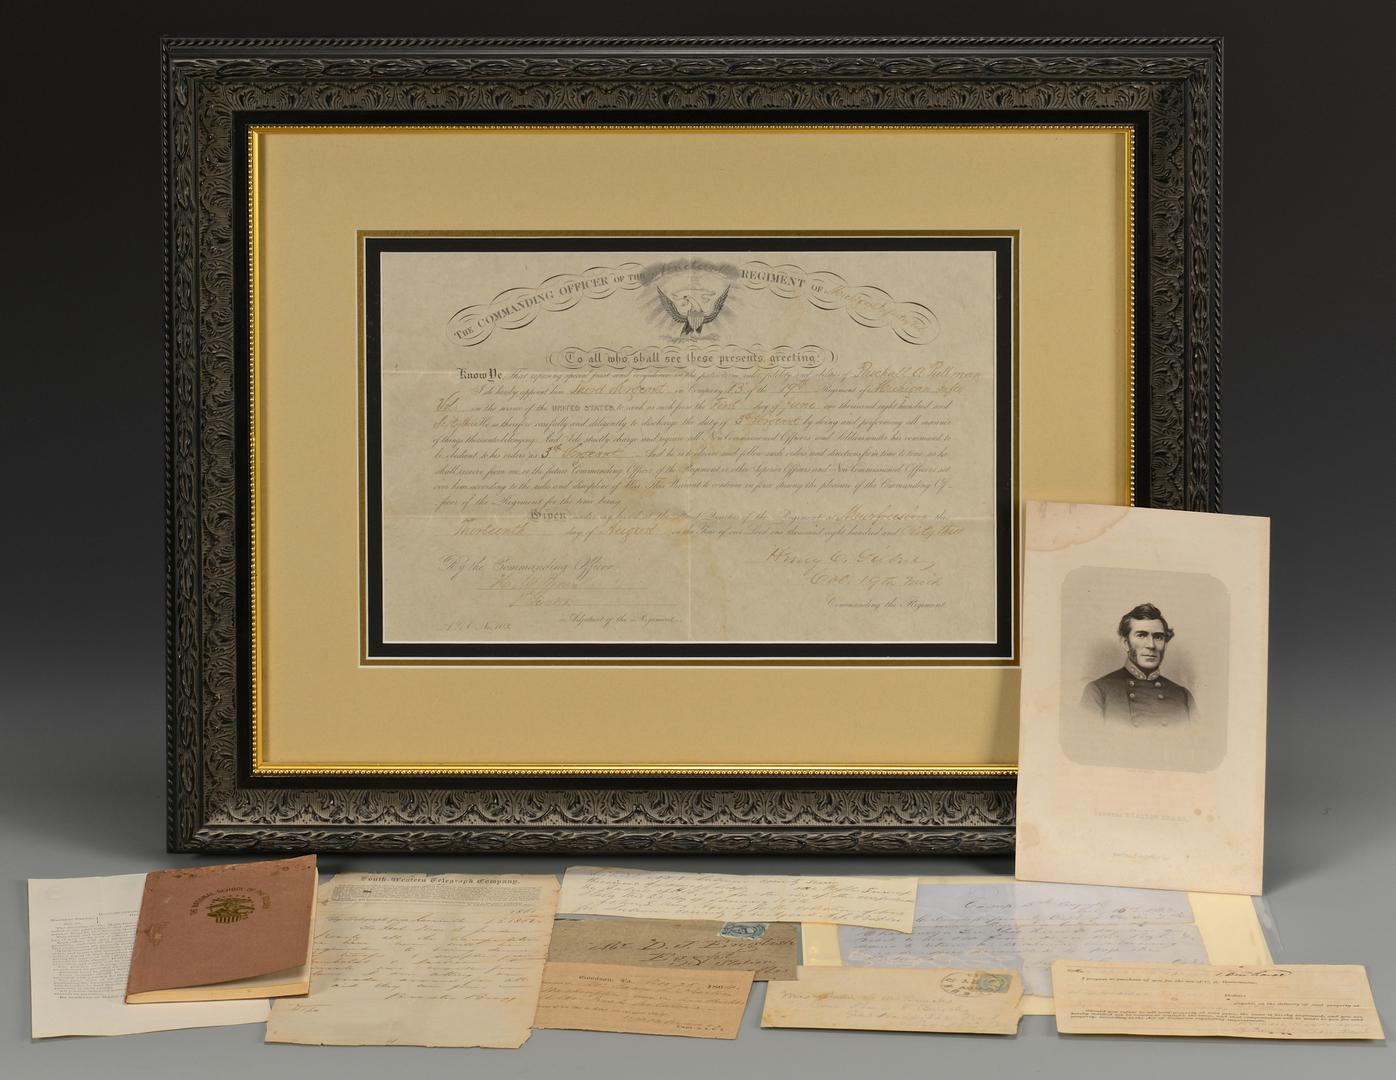 Lot 374: Group of 8 Civil War Documents & Ephemera